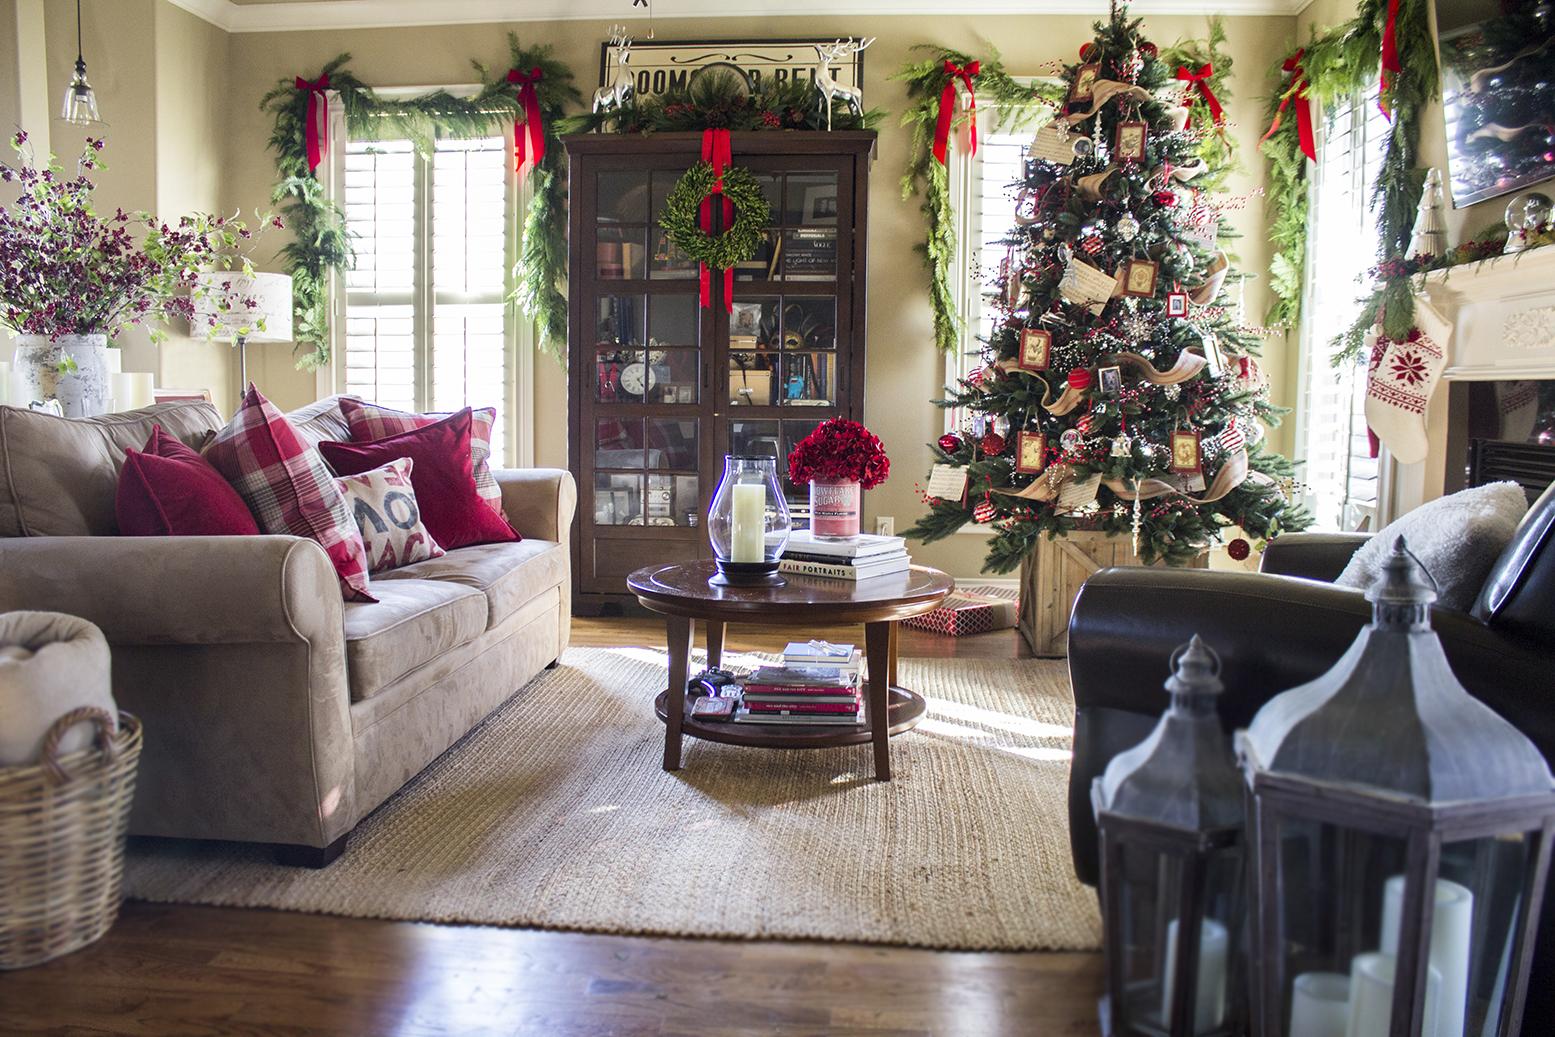 Holiday Home Tour Classic Christmas Decor